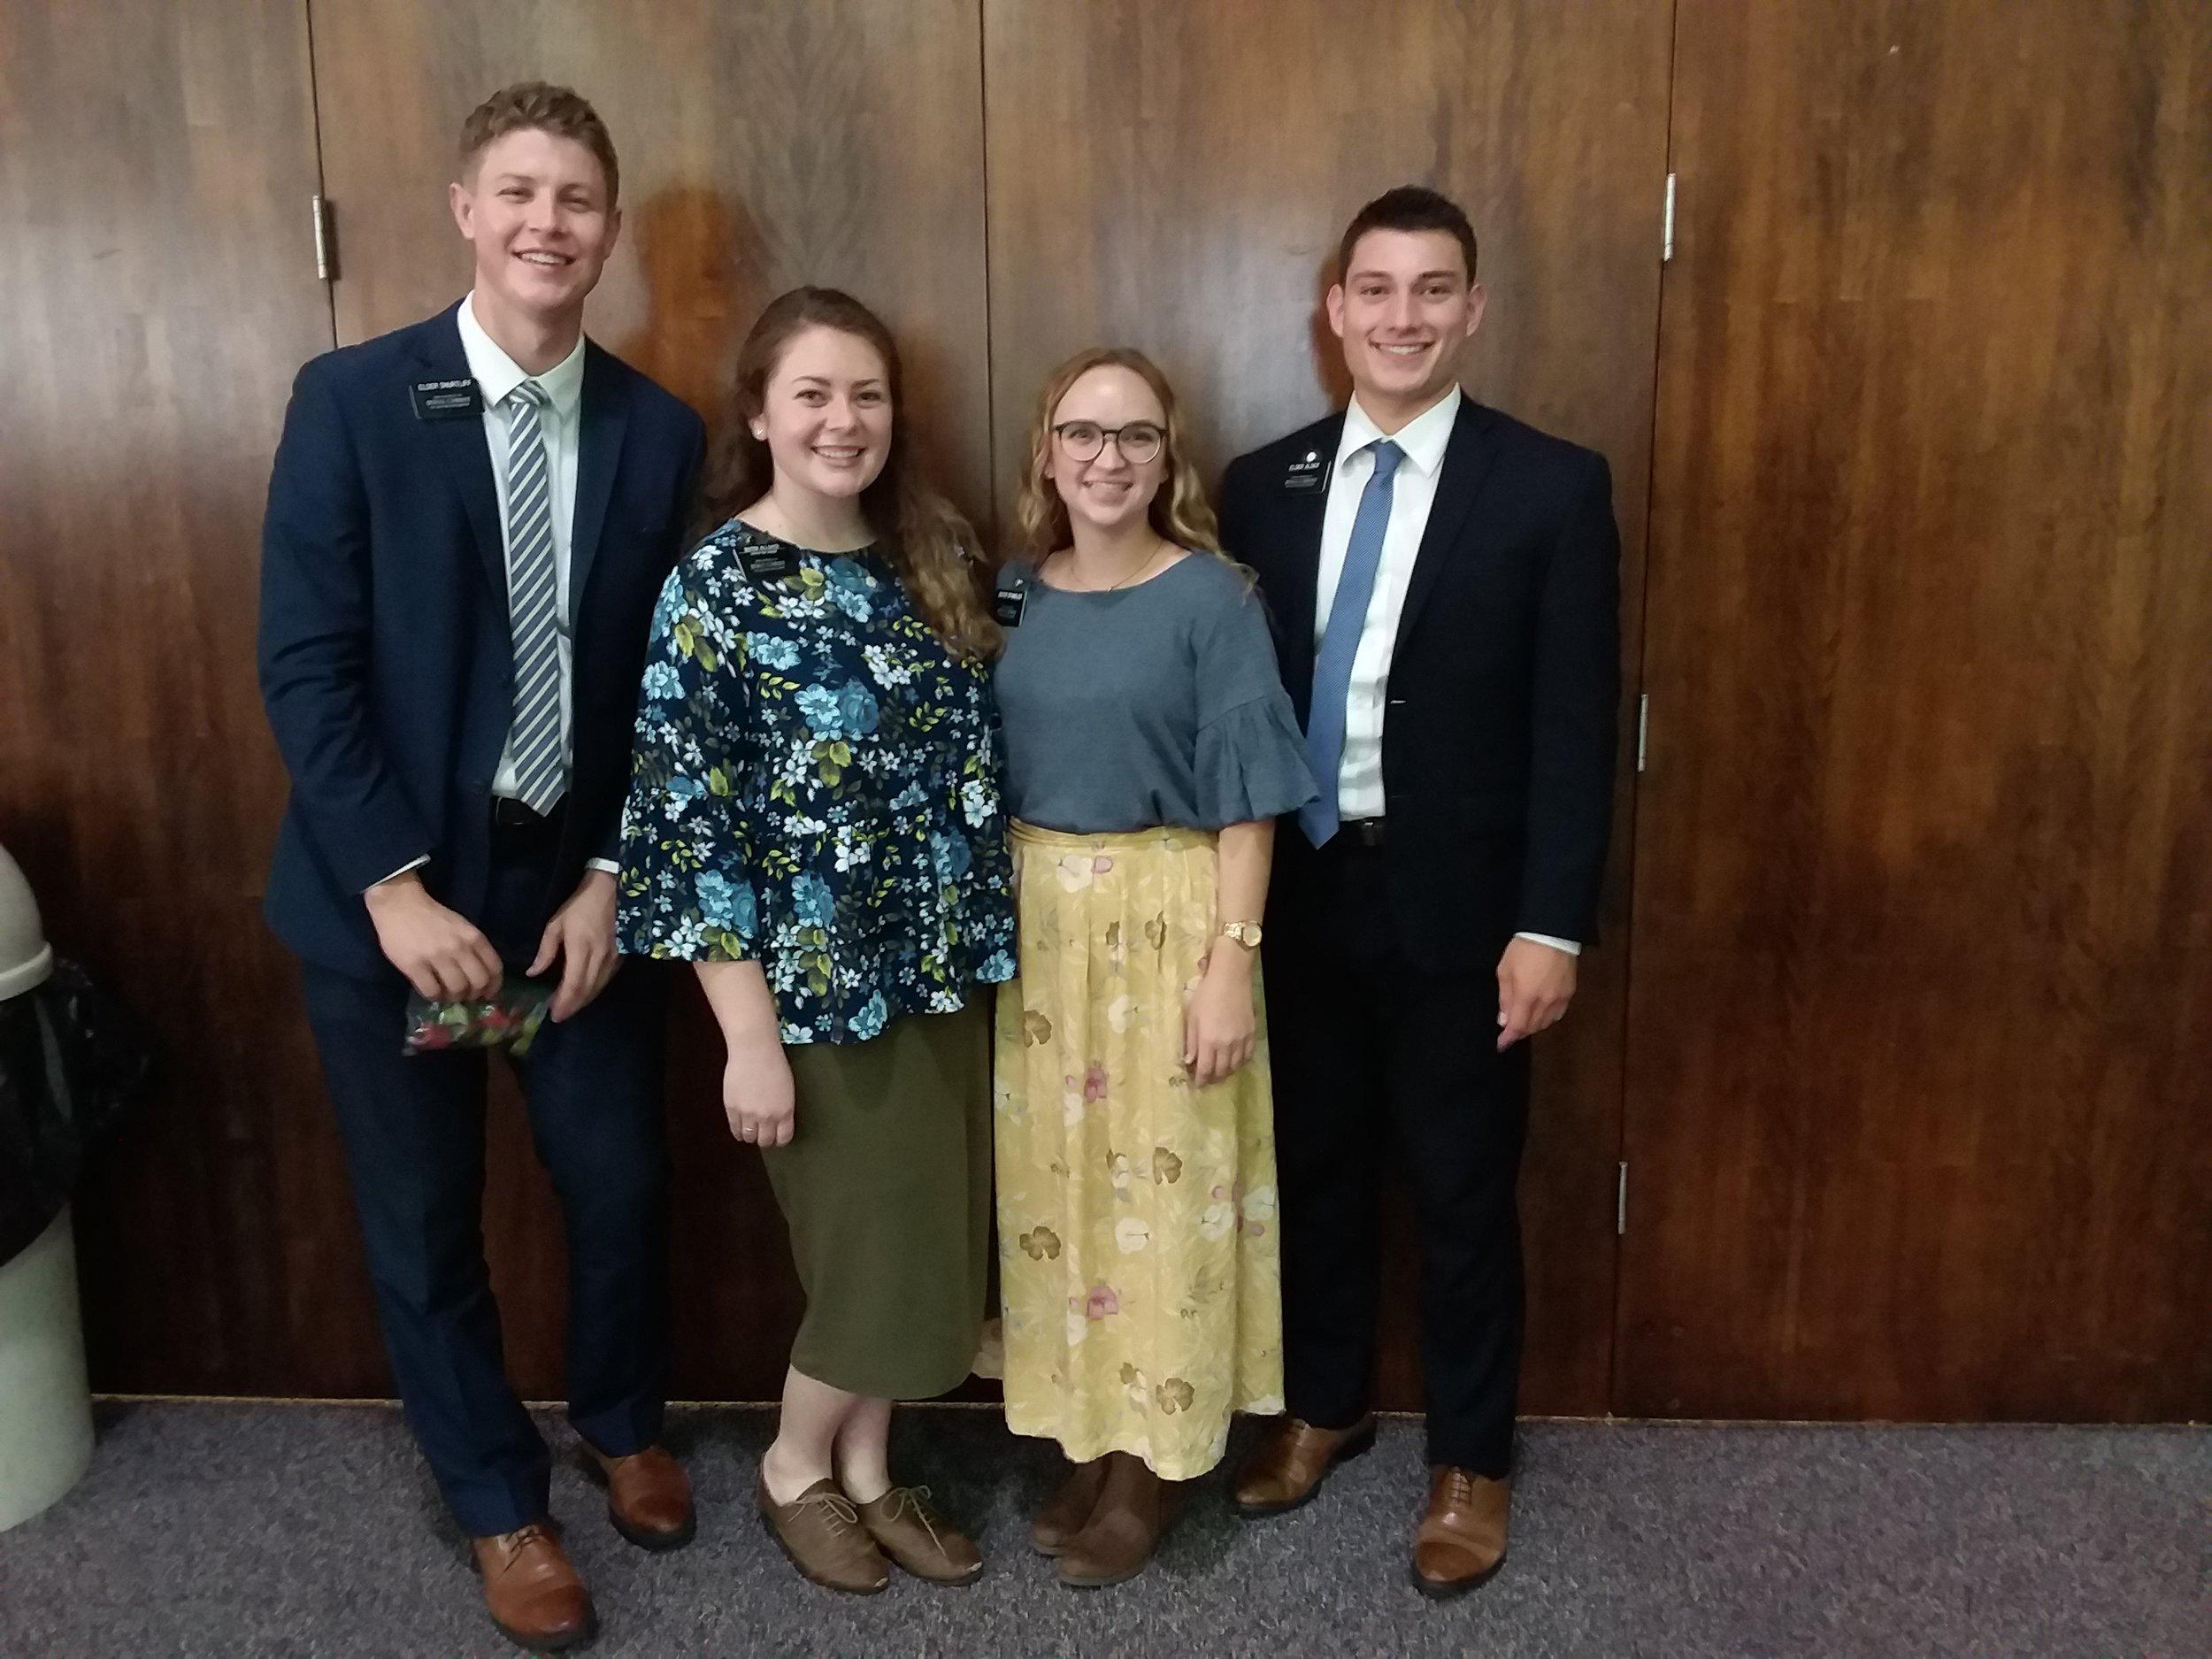 QuadSquad2k18 (e. Shurtliff, your fav sis missionary, s. Spangler, e. Alder)